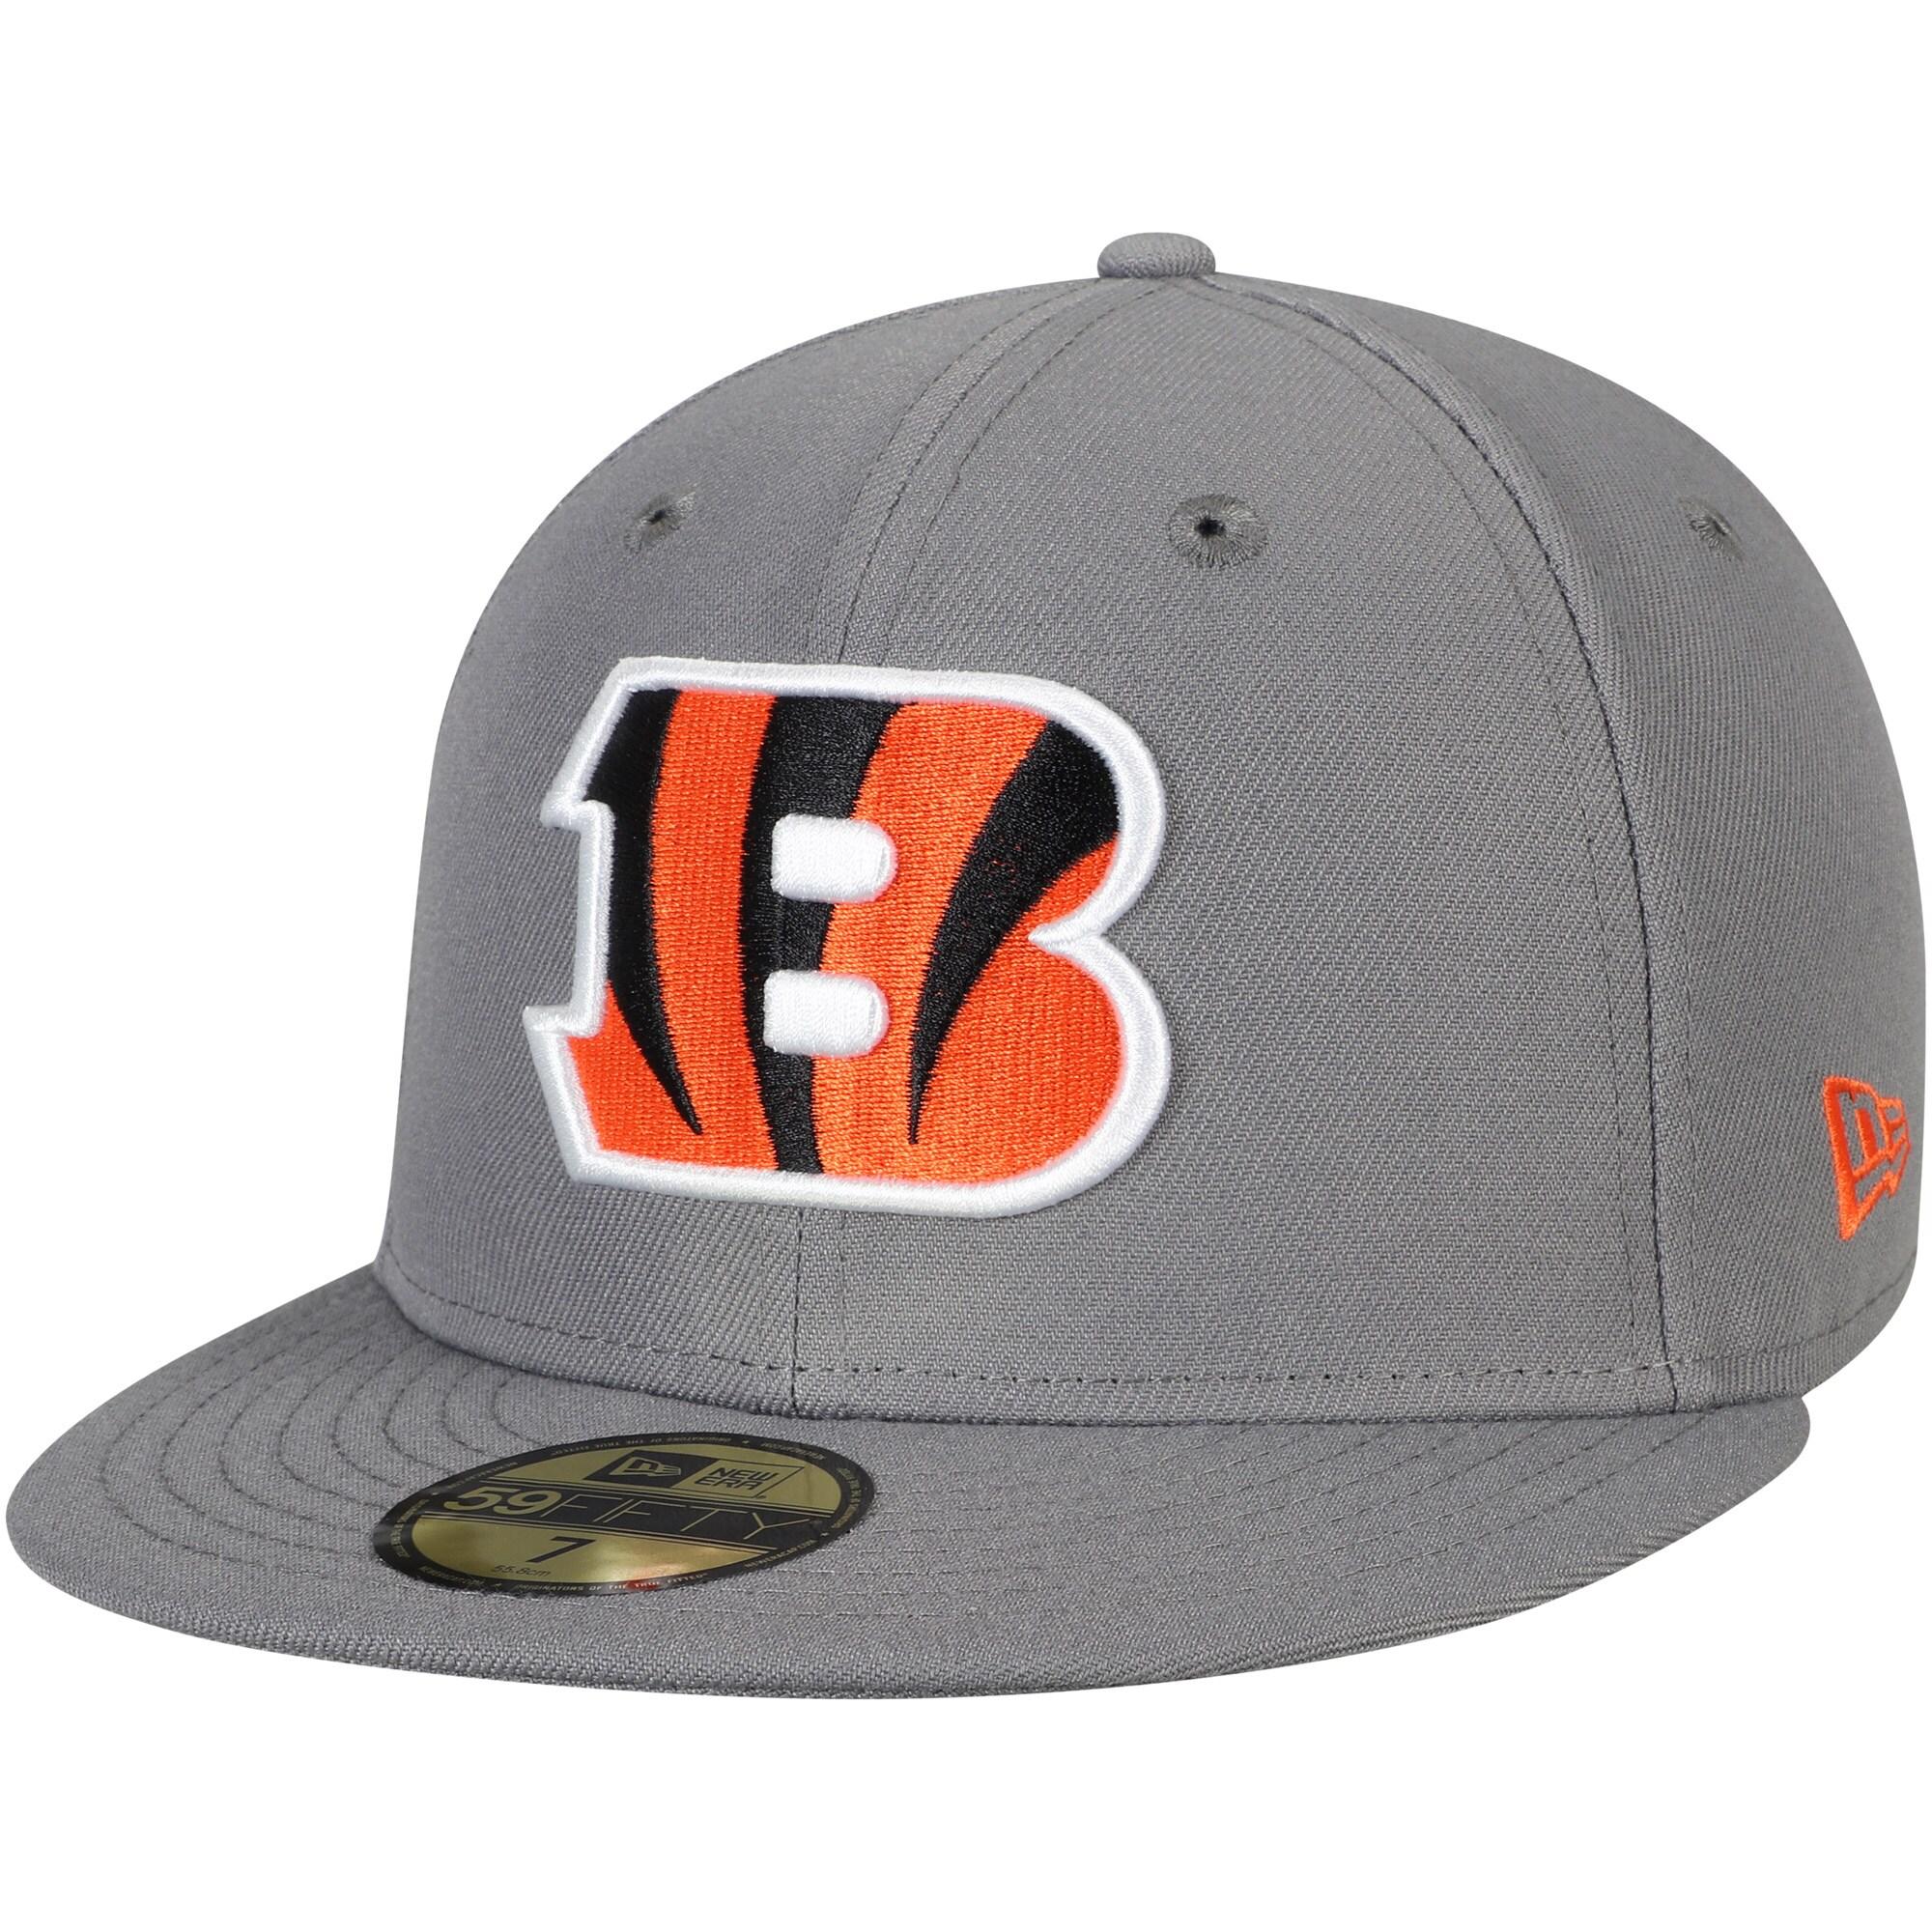 Cincinnati Bengals New Era Storm 59FIFTY Fitted Hat - Graphite